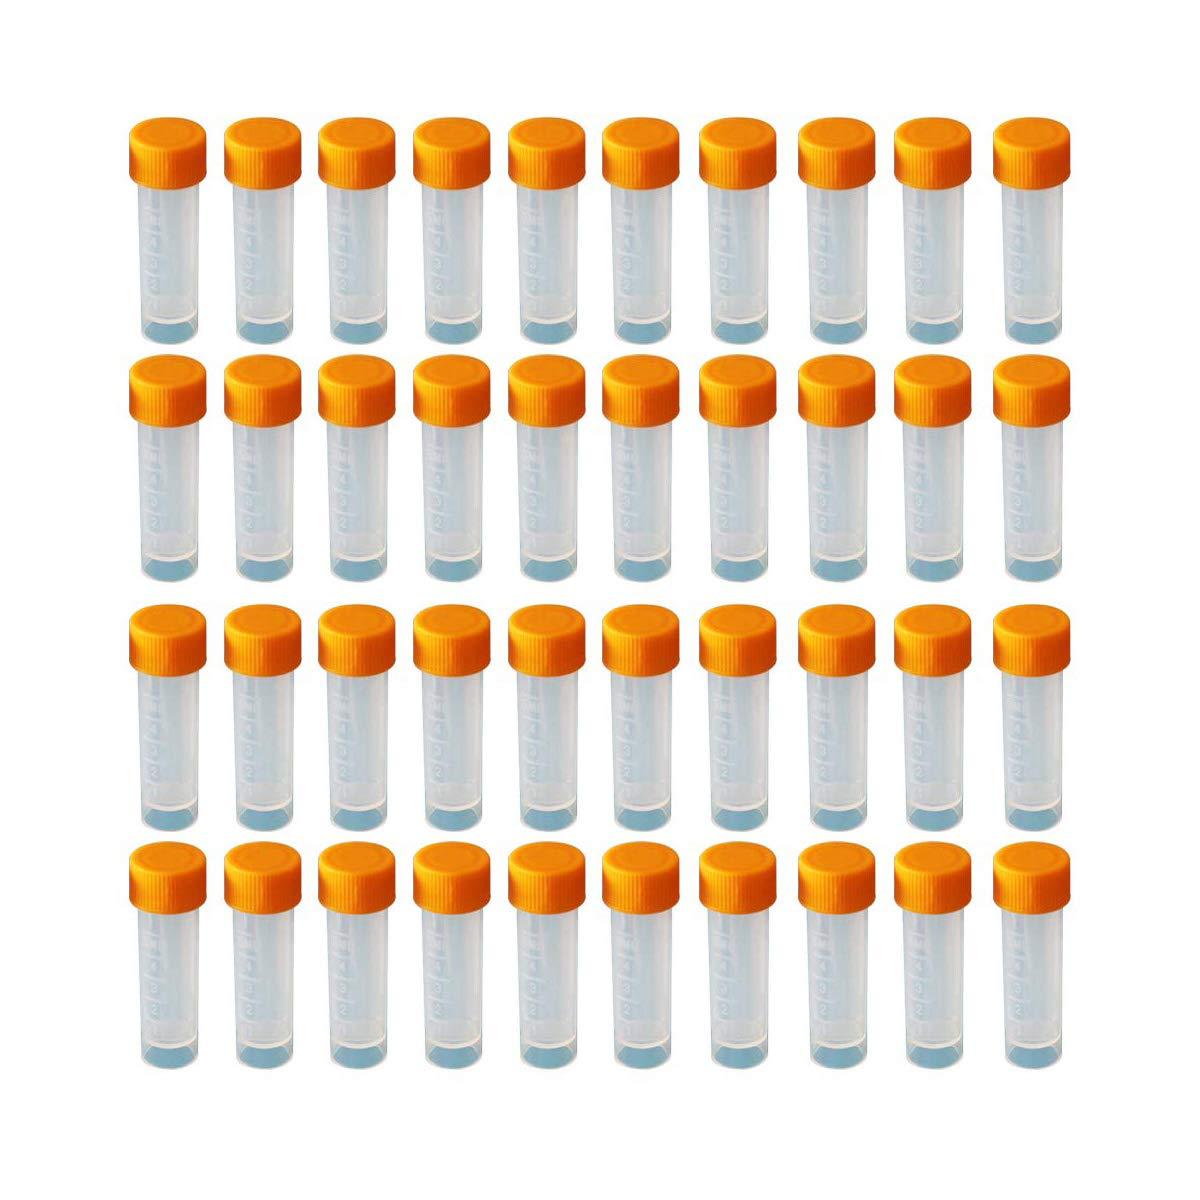 Marcas Graduadas HUAYAO 40PCS Tubo de Laboratorio de 5 ML de Pl/ástico Tubos de Ensayo de Pl/ástico con Tapa Tubos de Ensayo Congelados de Pl/ástico